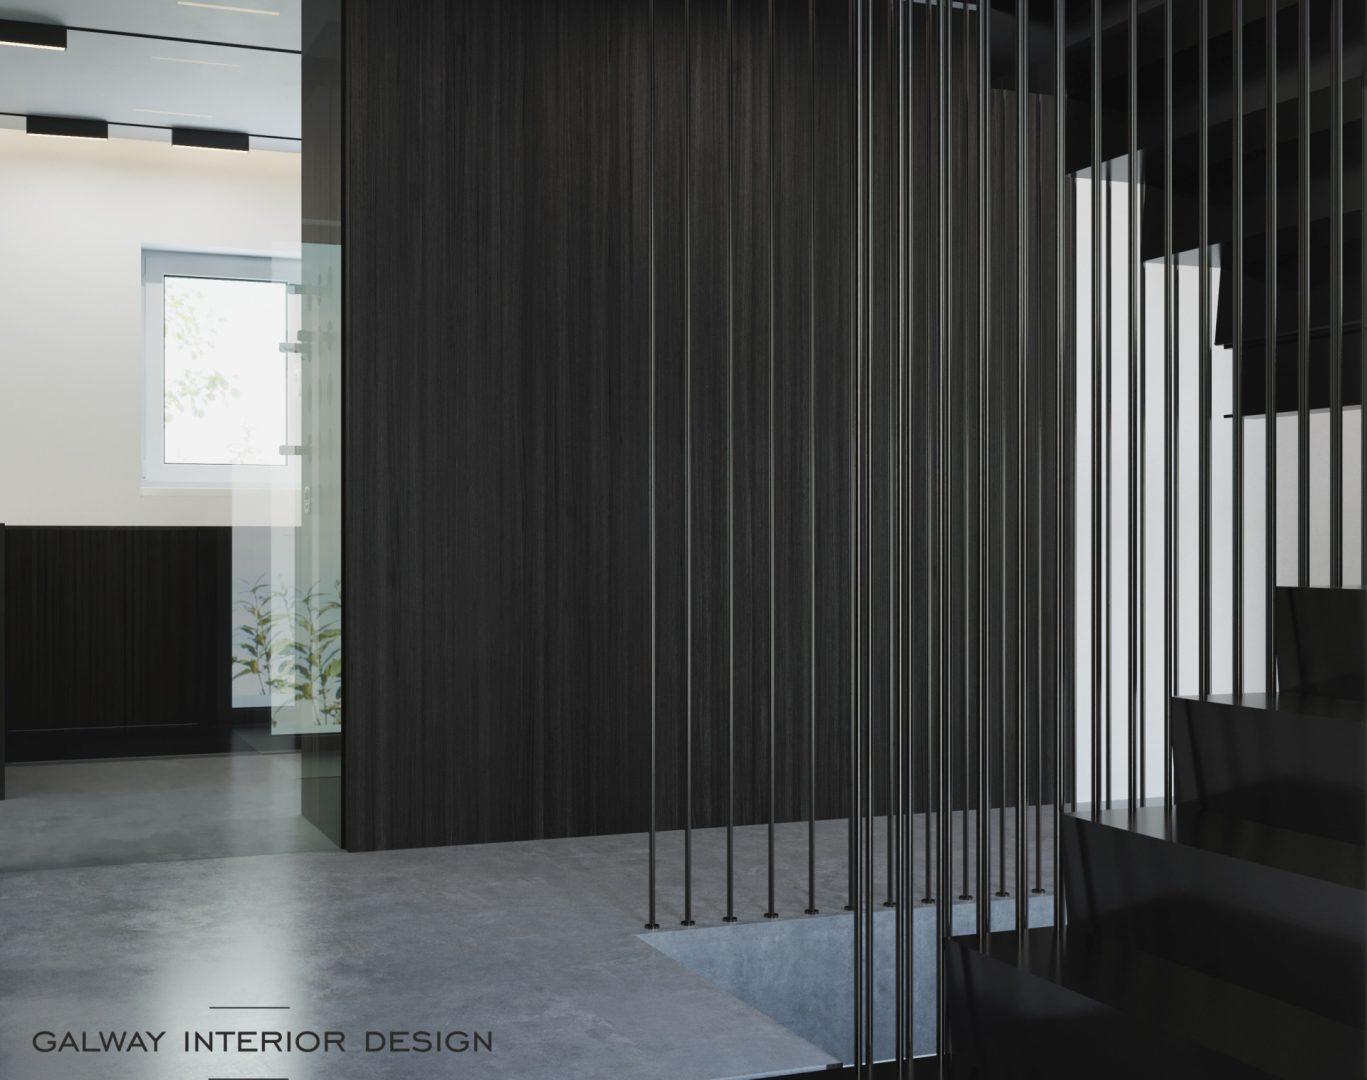 Galway Interior Design Lough Atalia FF Hall 1